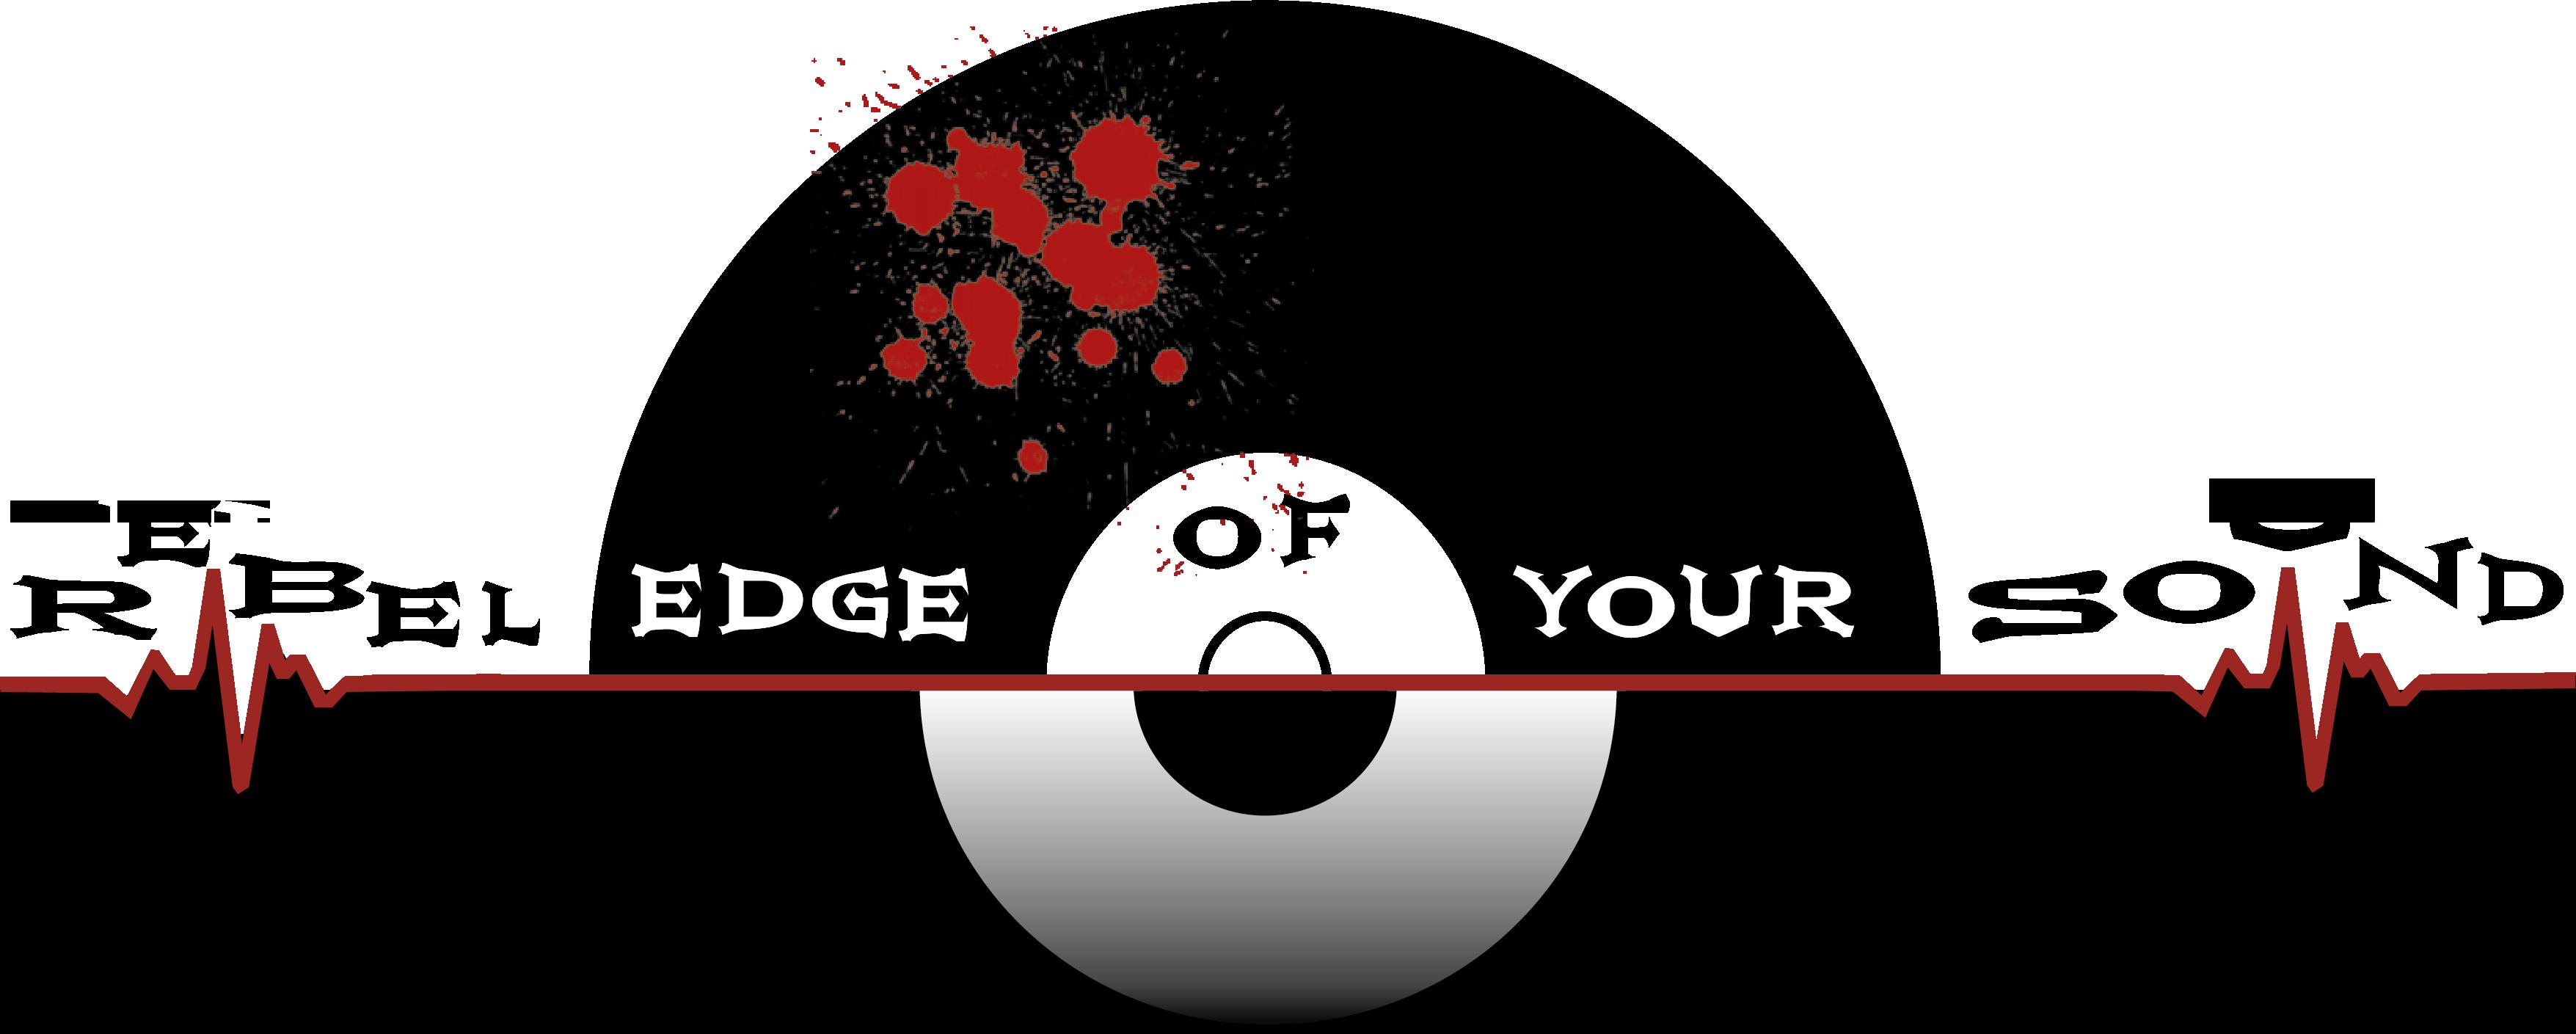 Rebel Edge of Your Sound